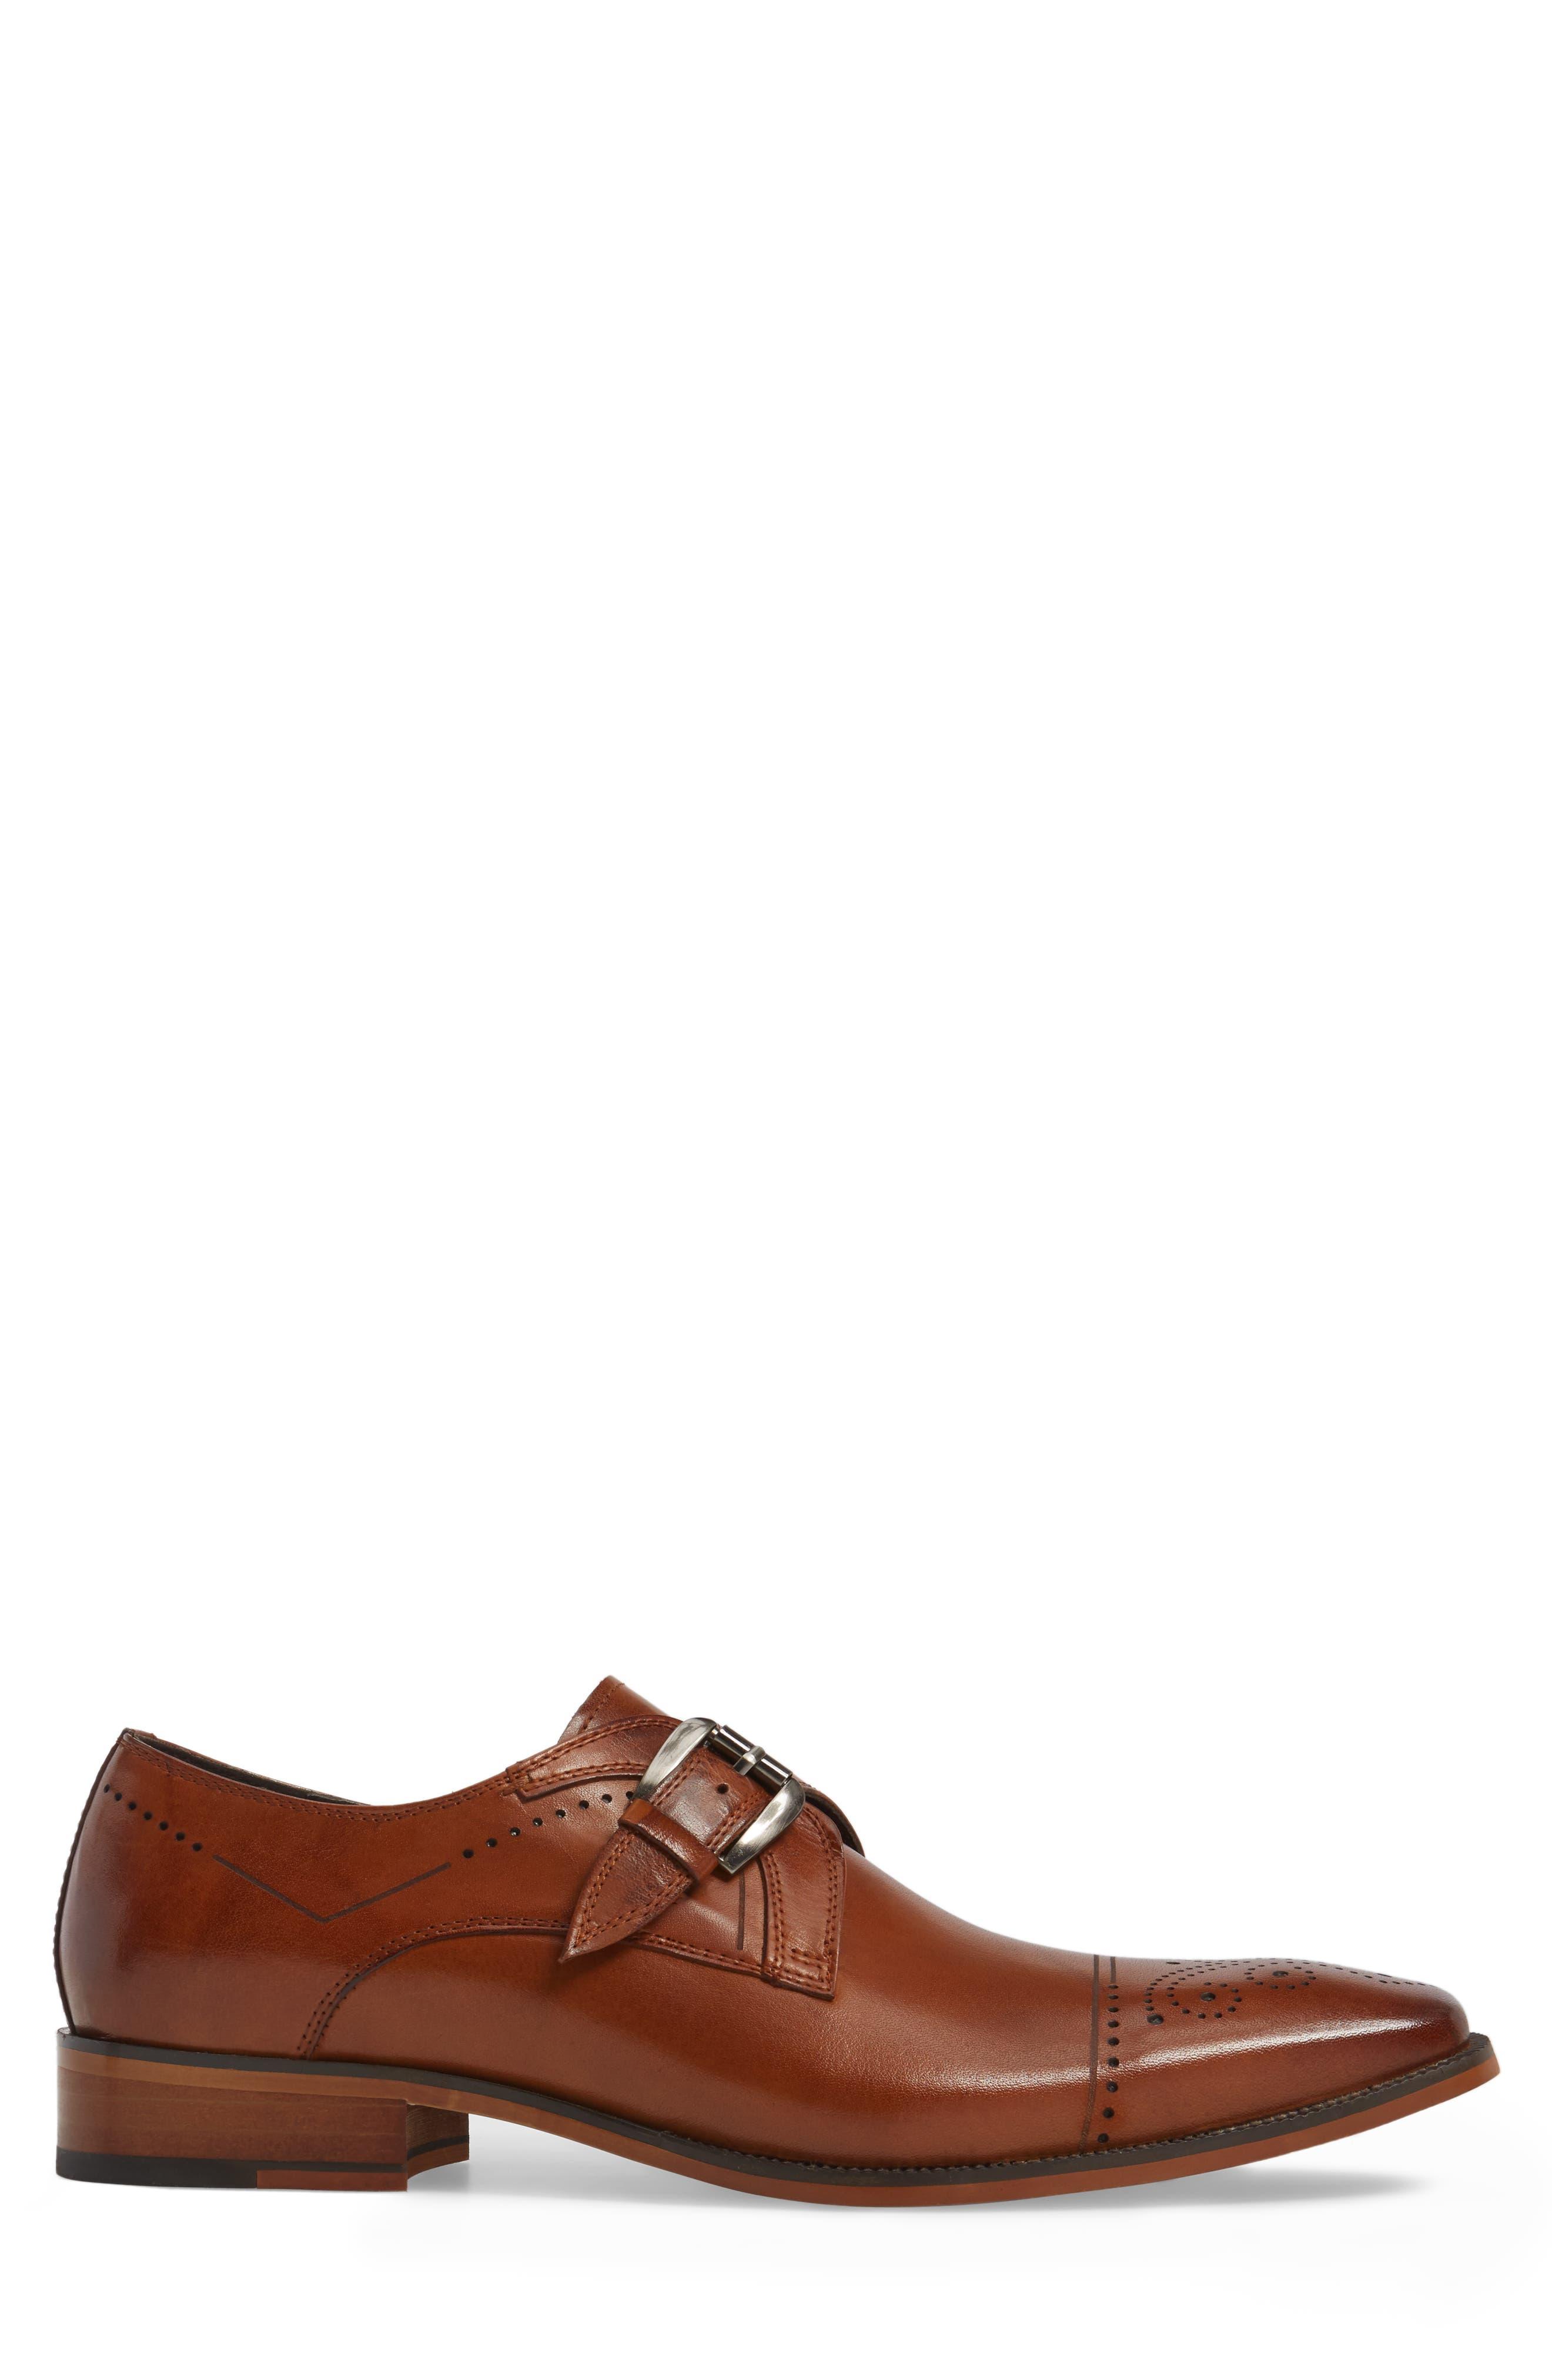 Alternate Image 3  - Stacy Adams Kimball Monk Strap Shoe (Men)